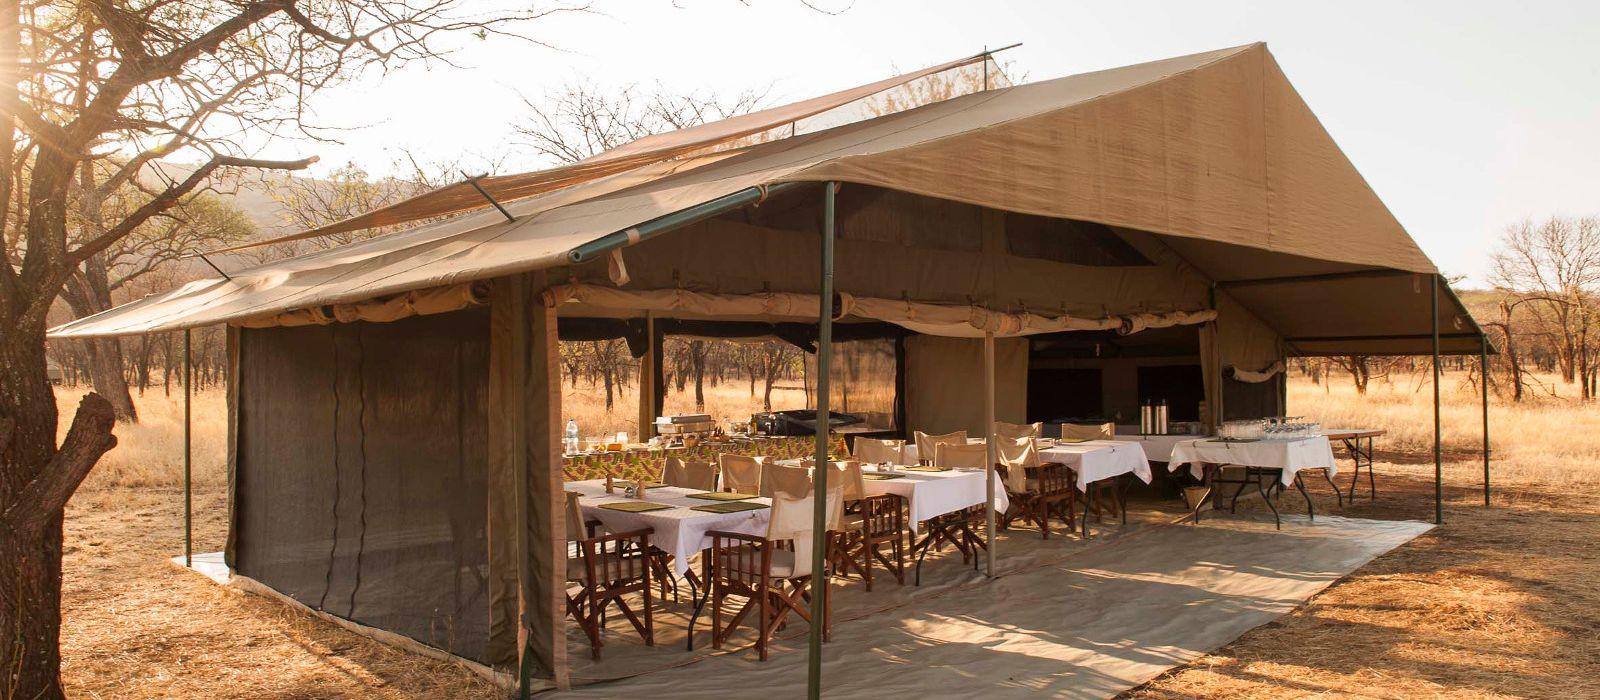 Hotel Serengeti Kati Kati Tented Camp Tanzania